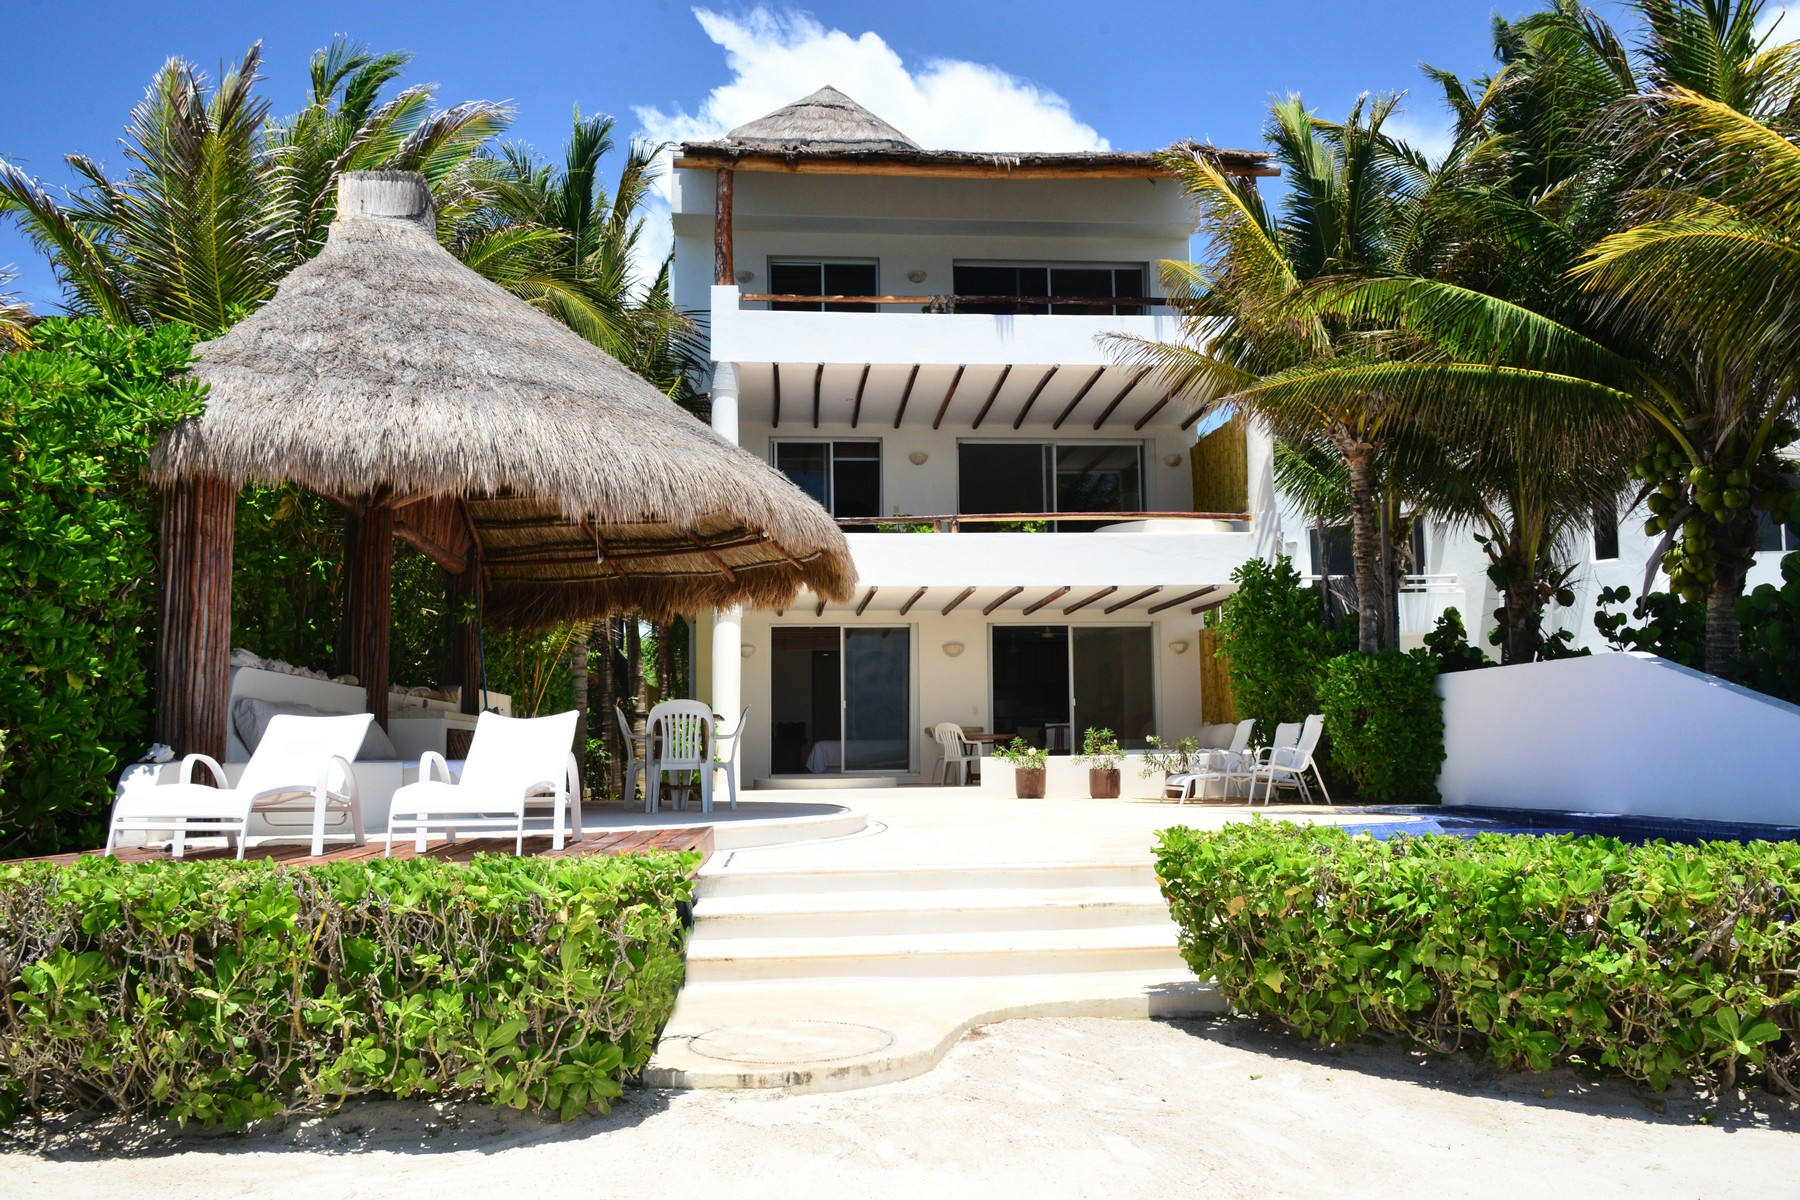 Additional photo for property listing at PENTHOUSE PARAISO FRENTE AL MAR Seafront Paradise Penthouse Predio Maria Irene, Supermzna 12, Mzna 21 13 Puerto Morelos, Quintana Roo 77930 México